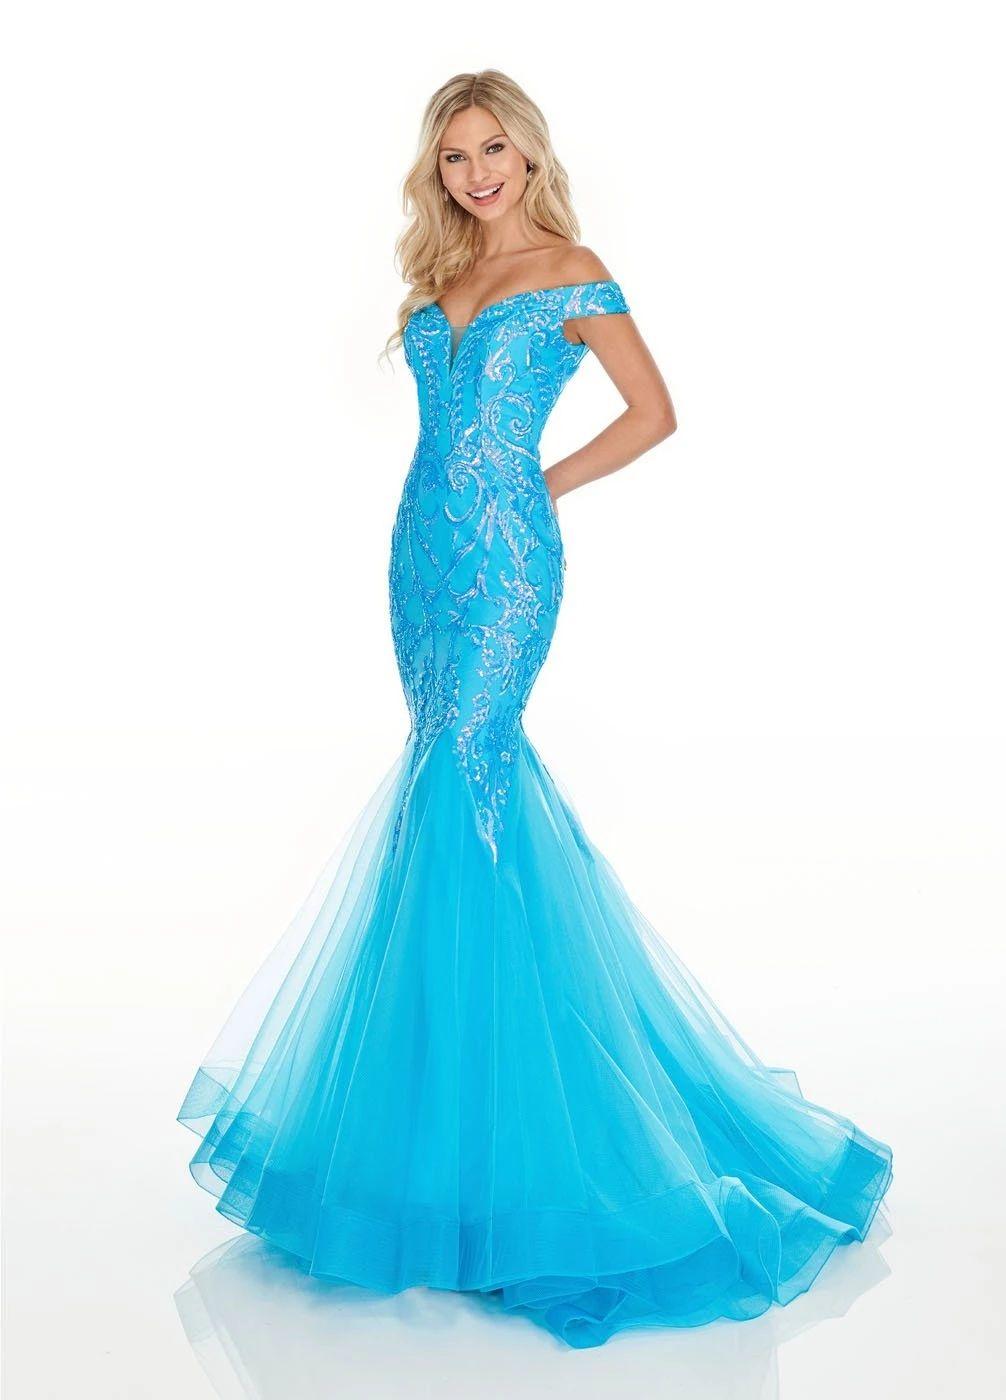 Rachel Allan 7199 Dress Neon Prom Dresses Off Shoulder Mermaid Dress Rachel Allan Dresses [ 1400 x 1006 Pixel ]